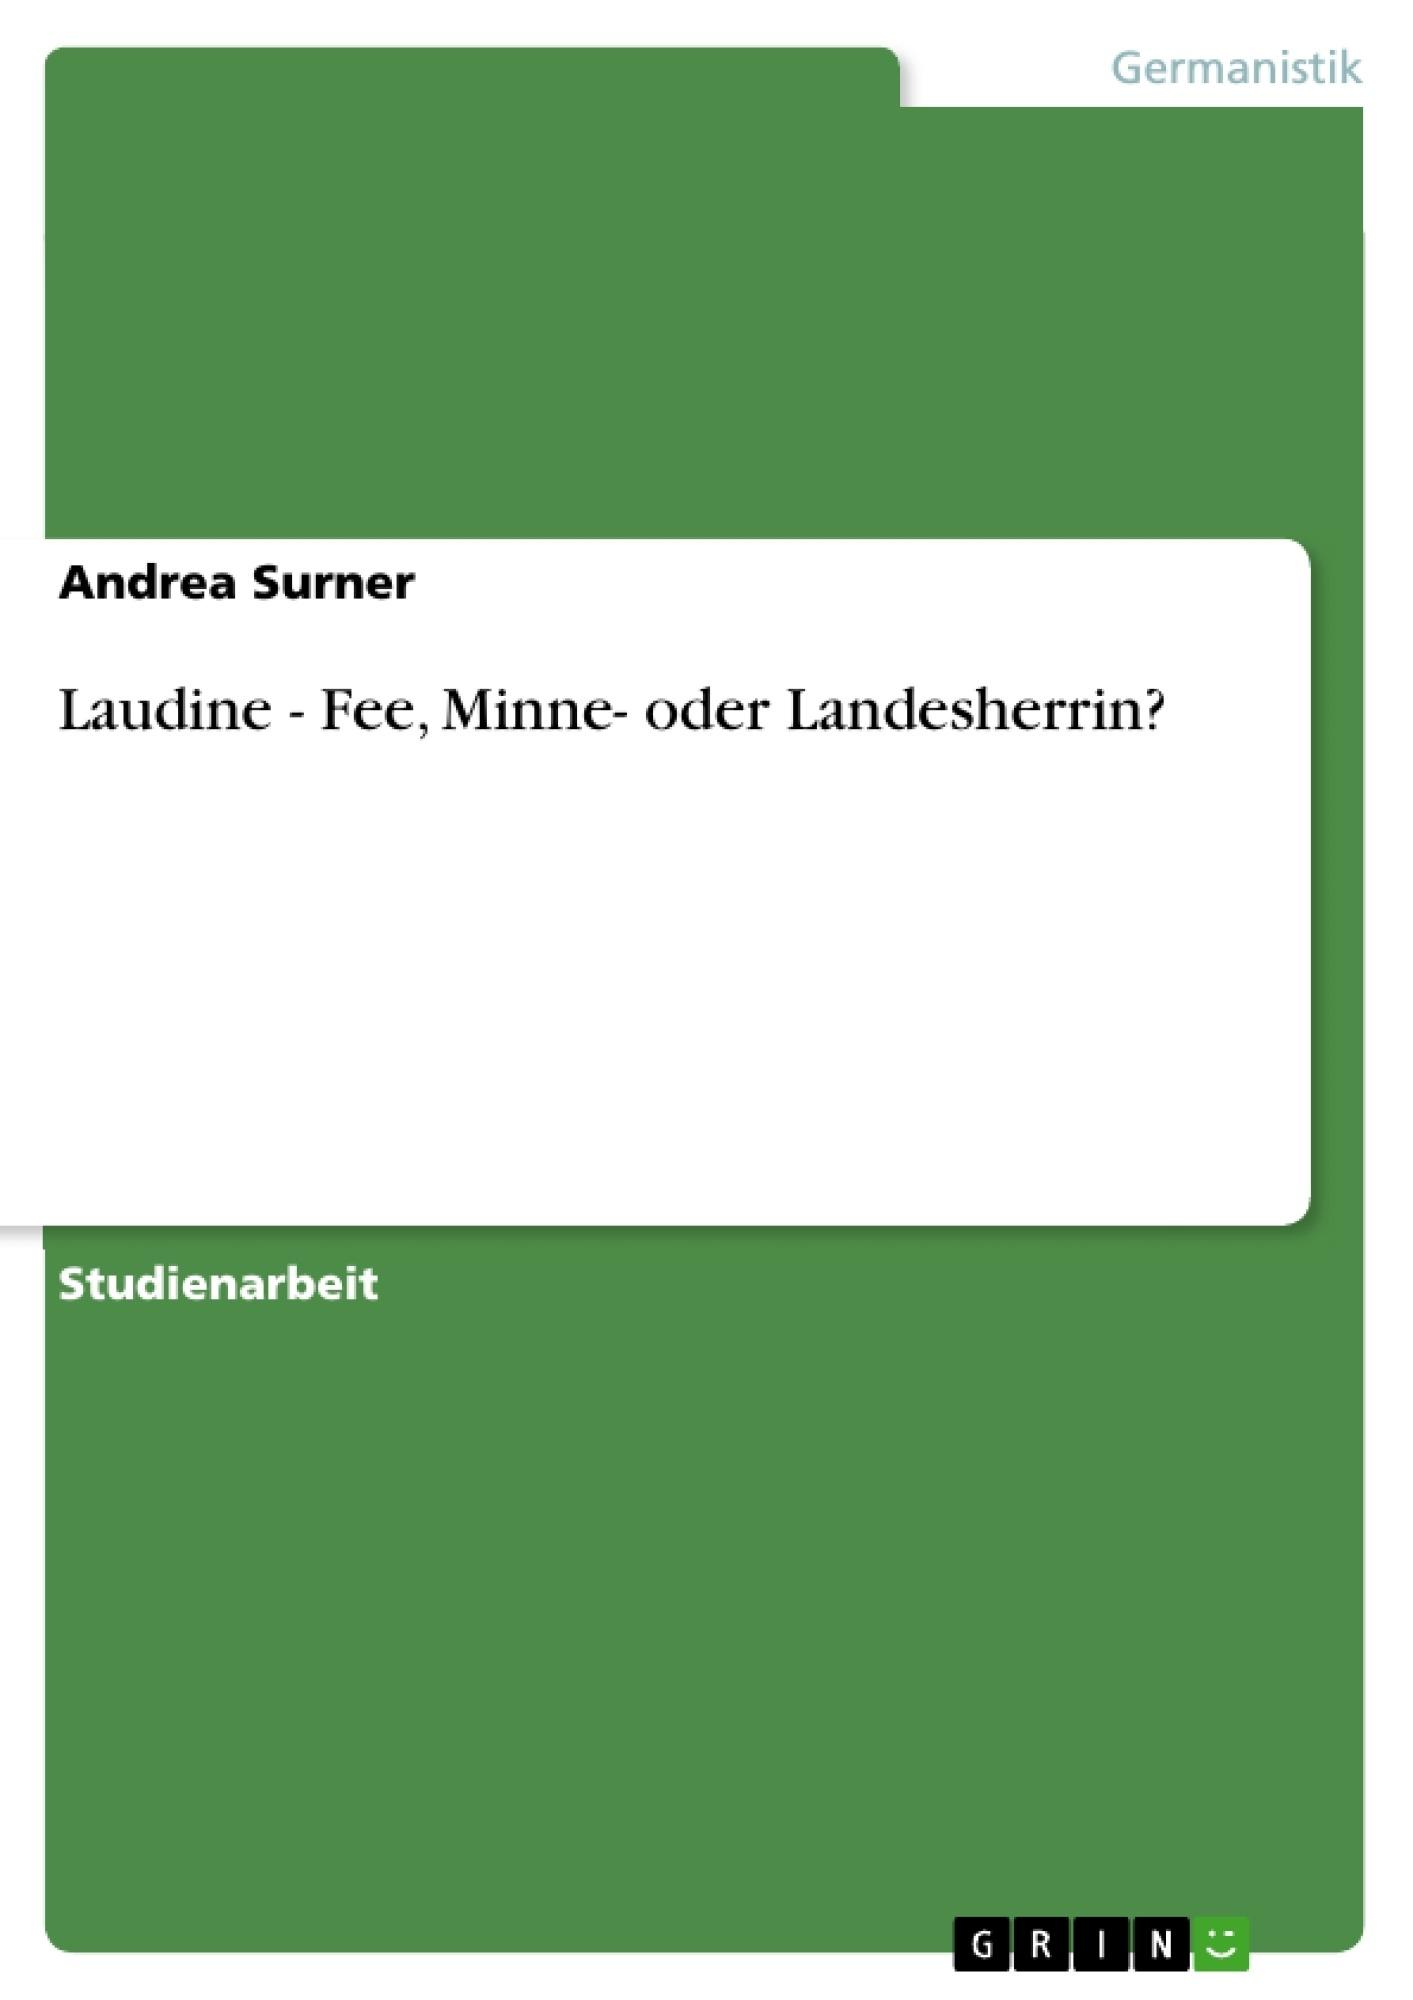 Titel: Laudine - Fee, Minne- oder Landesherrin?